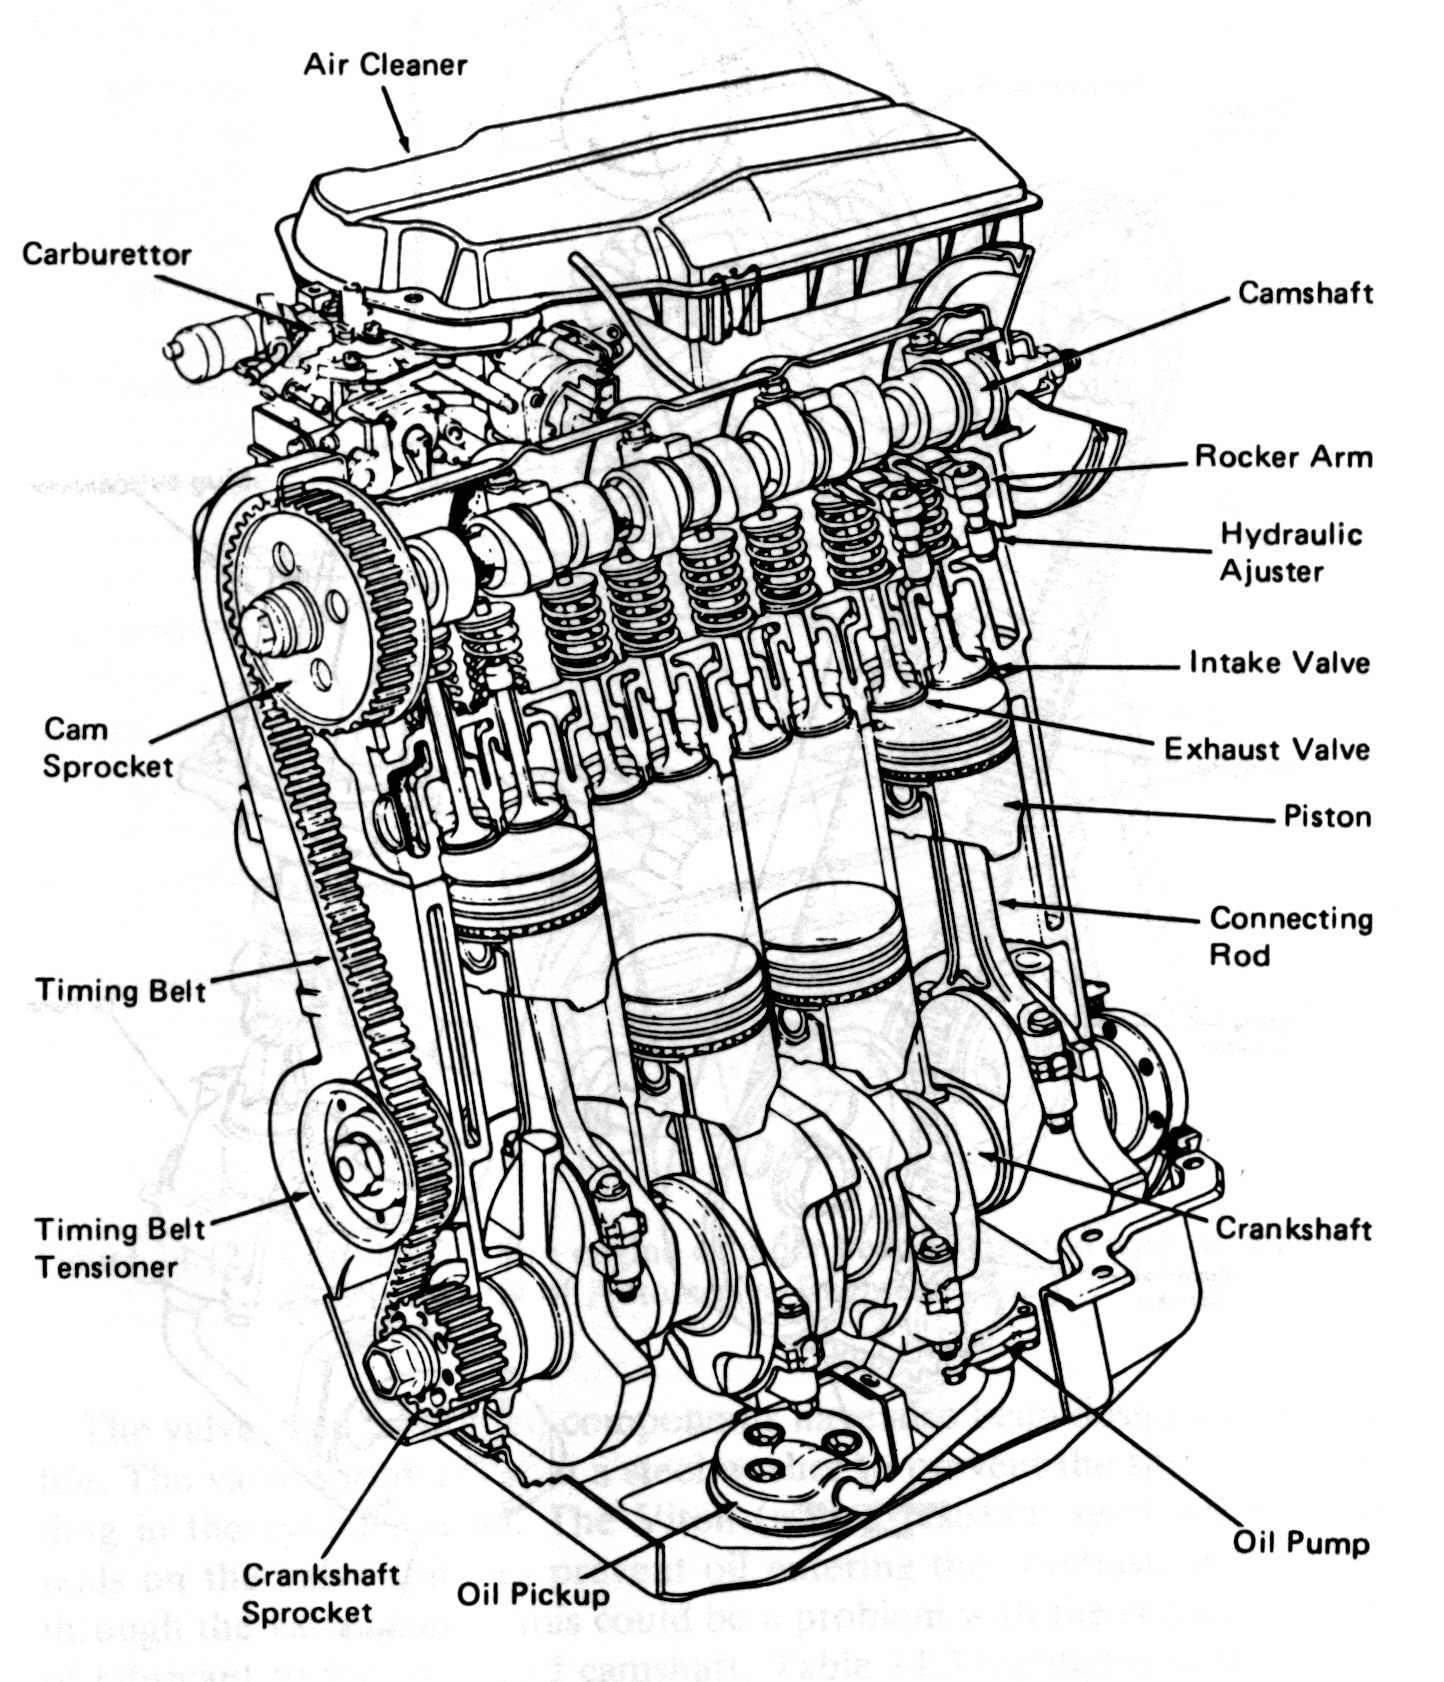 Diesel Engine Diagram Labeled Car Engine Diagram for